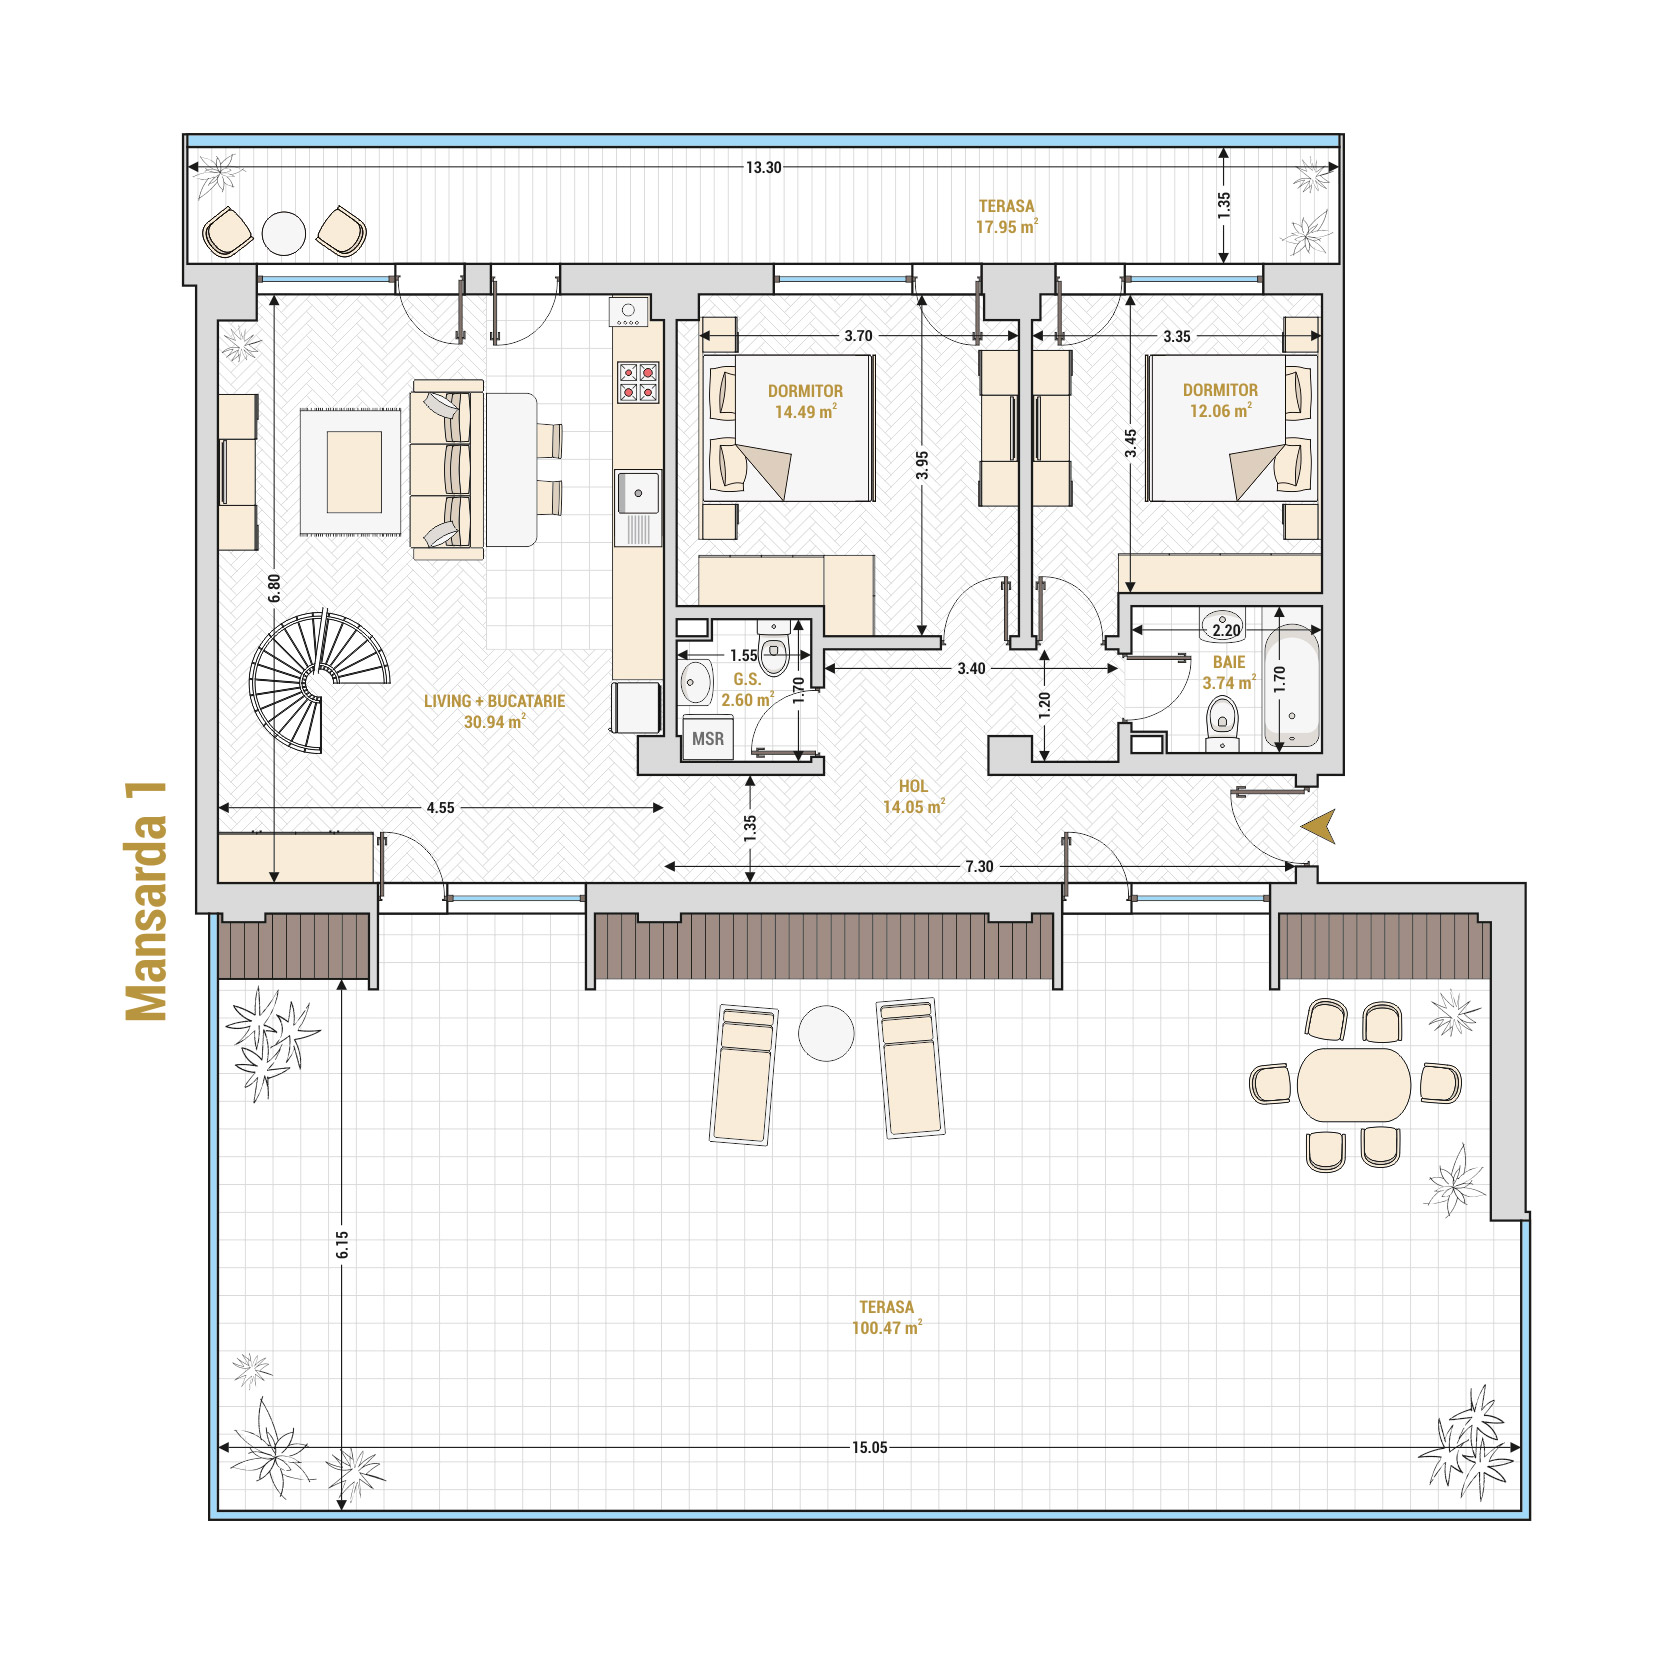 Duplex 5 camere de vanzare Bucuresti - Catedral Residence - Marriott, Piata Unirii, 13 Septembrie, Izvor - Tip 2 - T2A - A